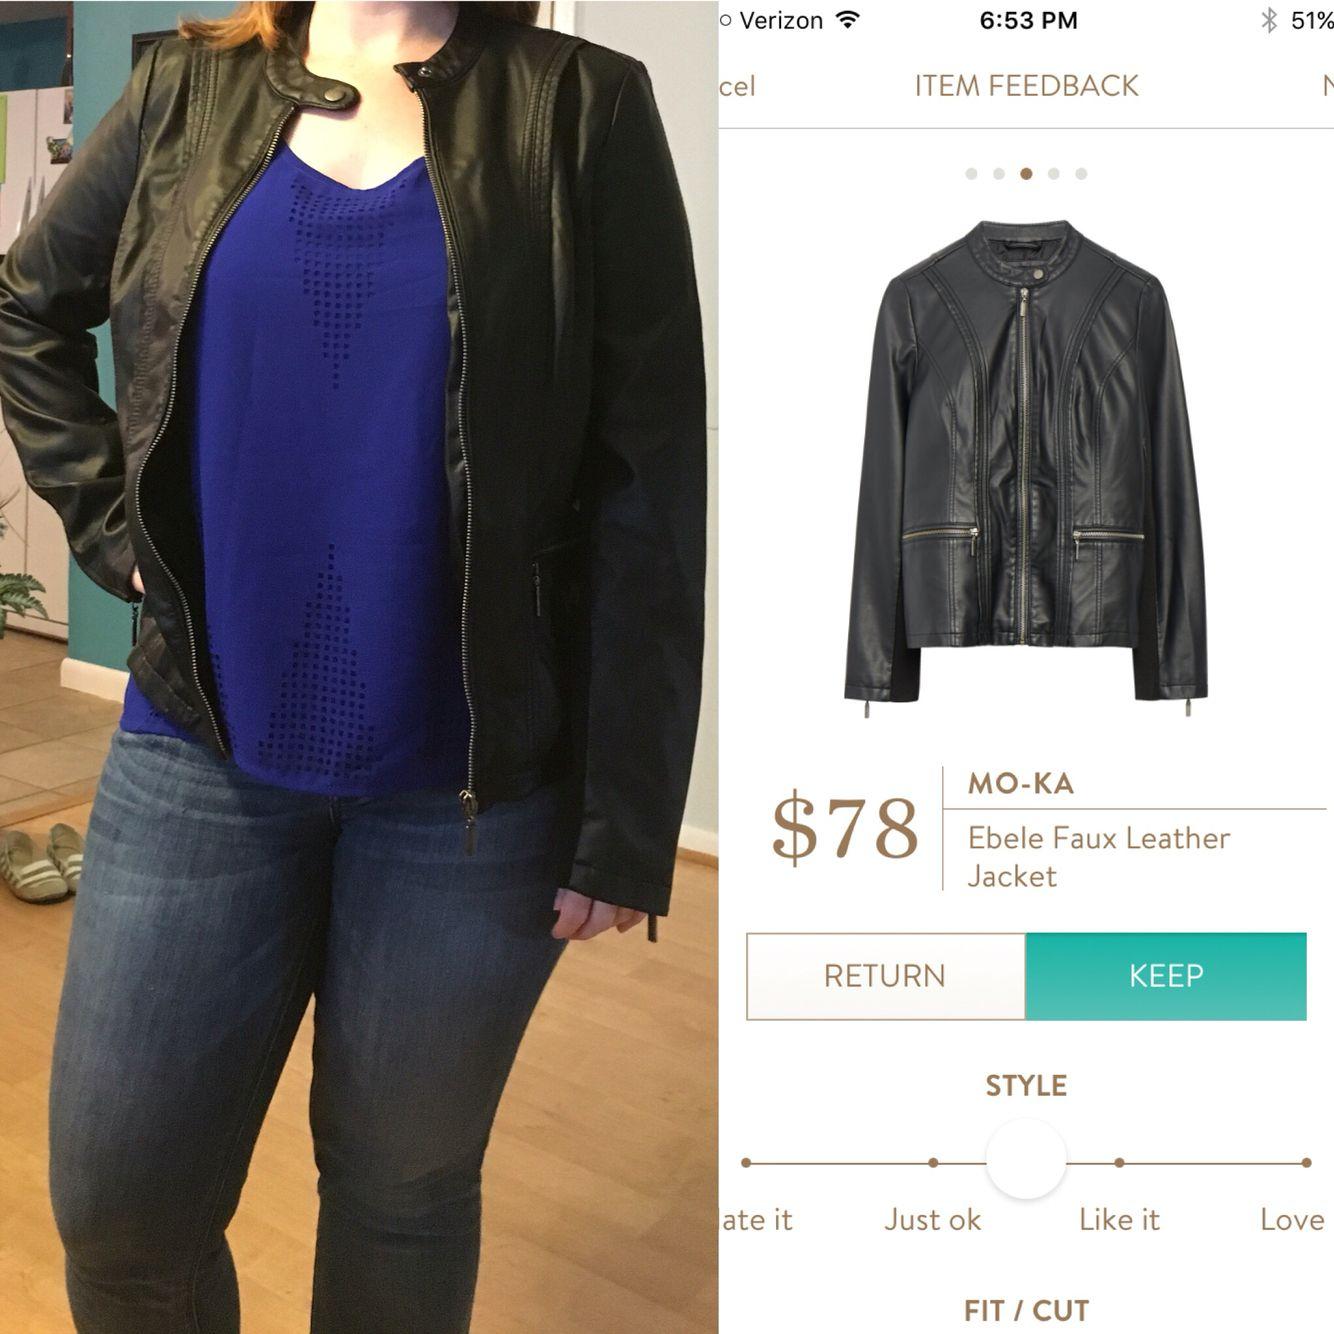 92c47be5043 Mo-ka ebele faux leather jacket #stichfix | FB Stitch Fix Group ...